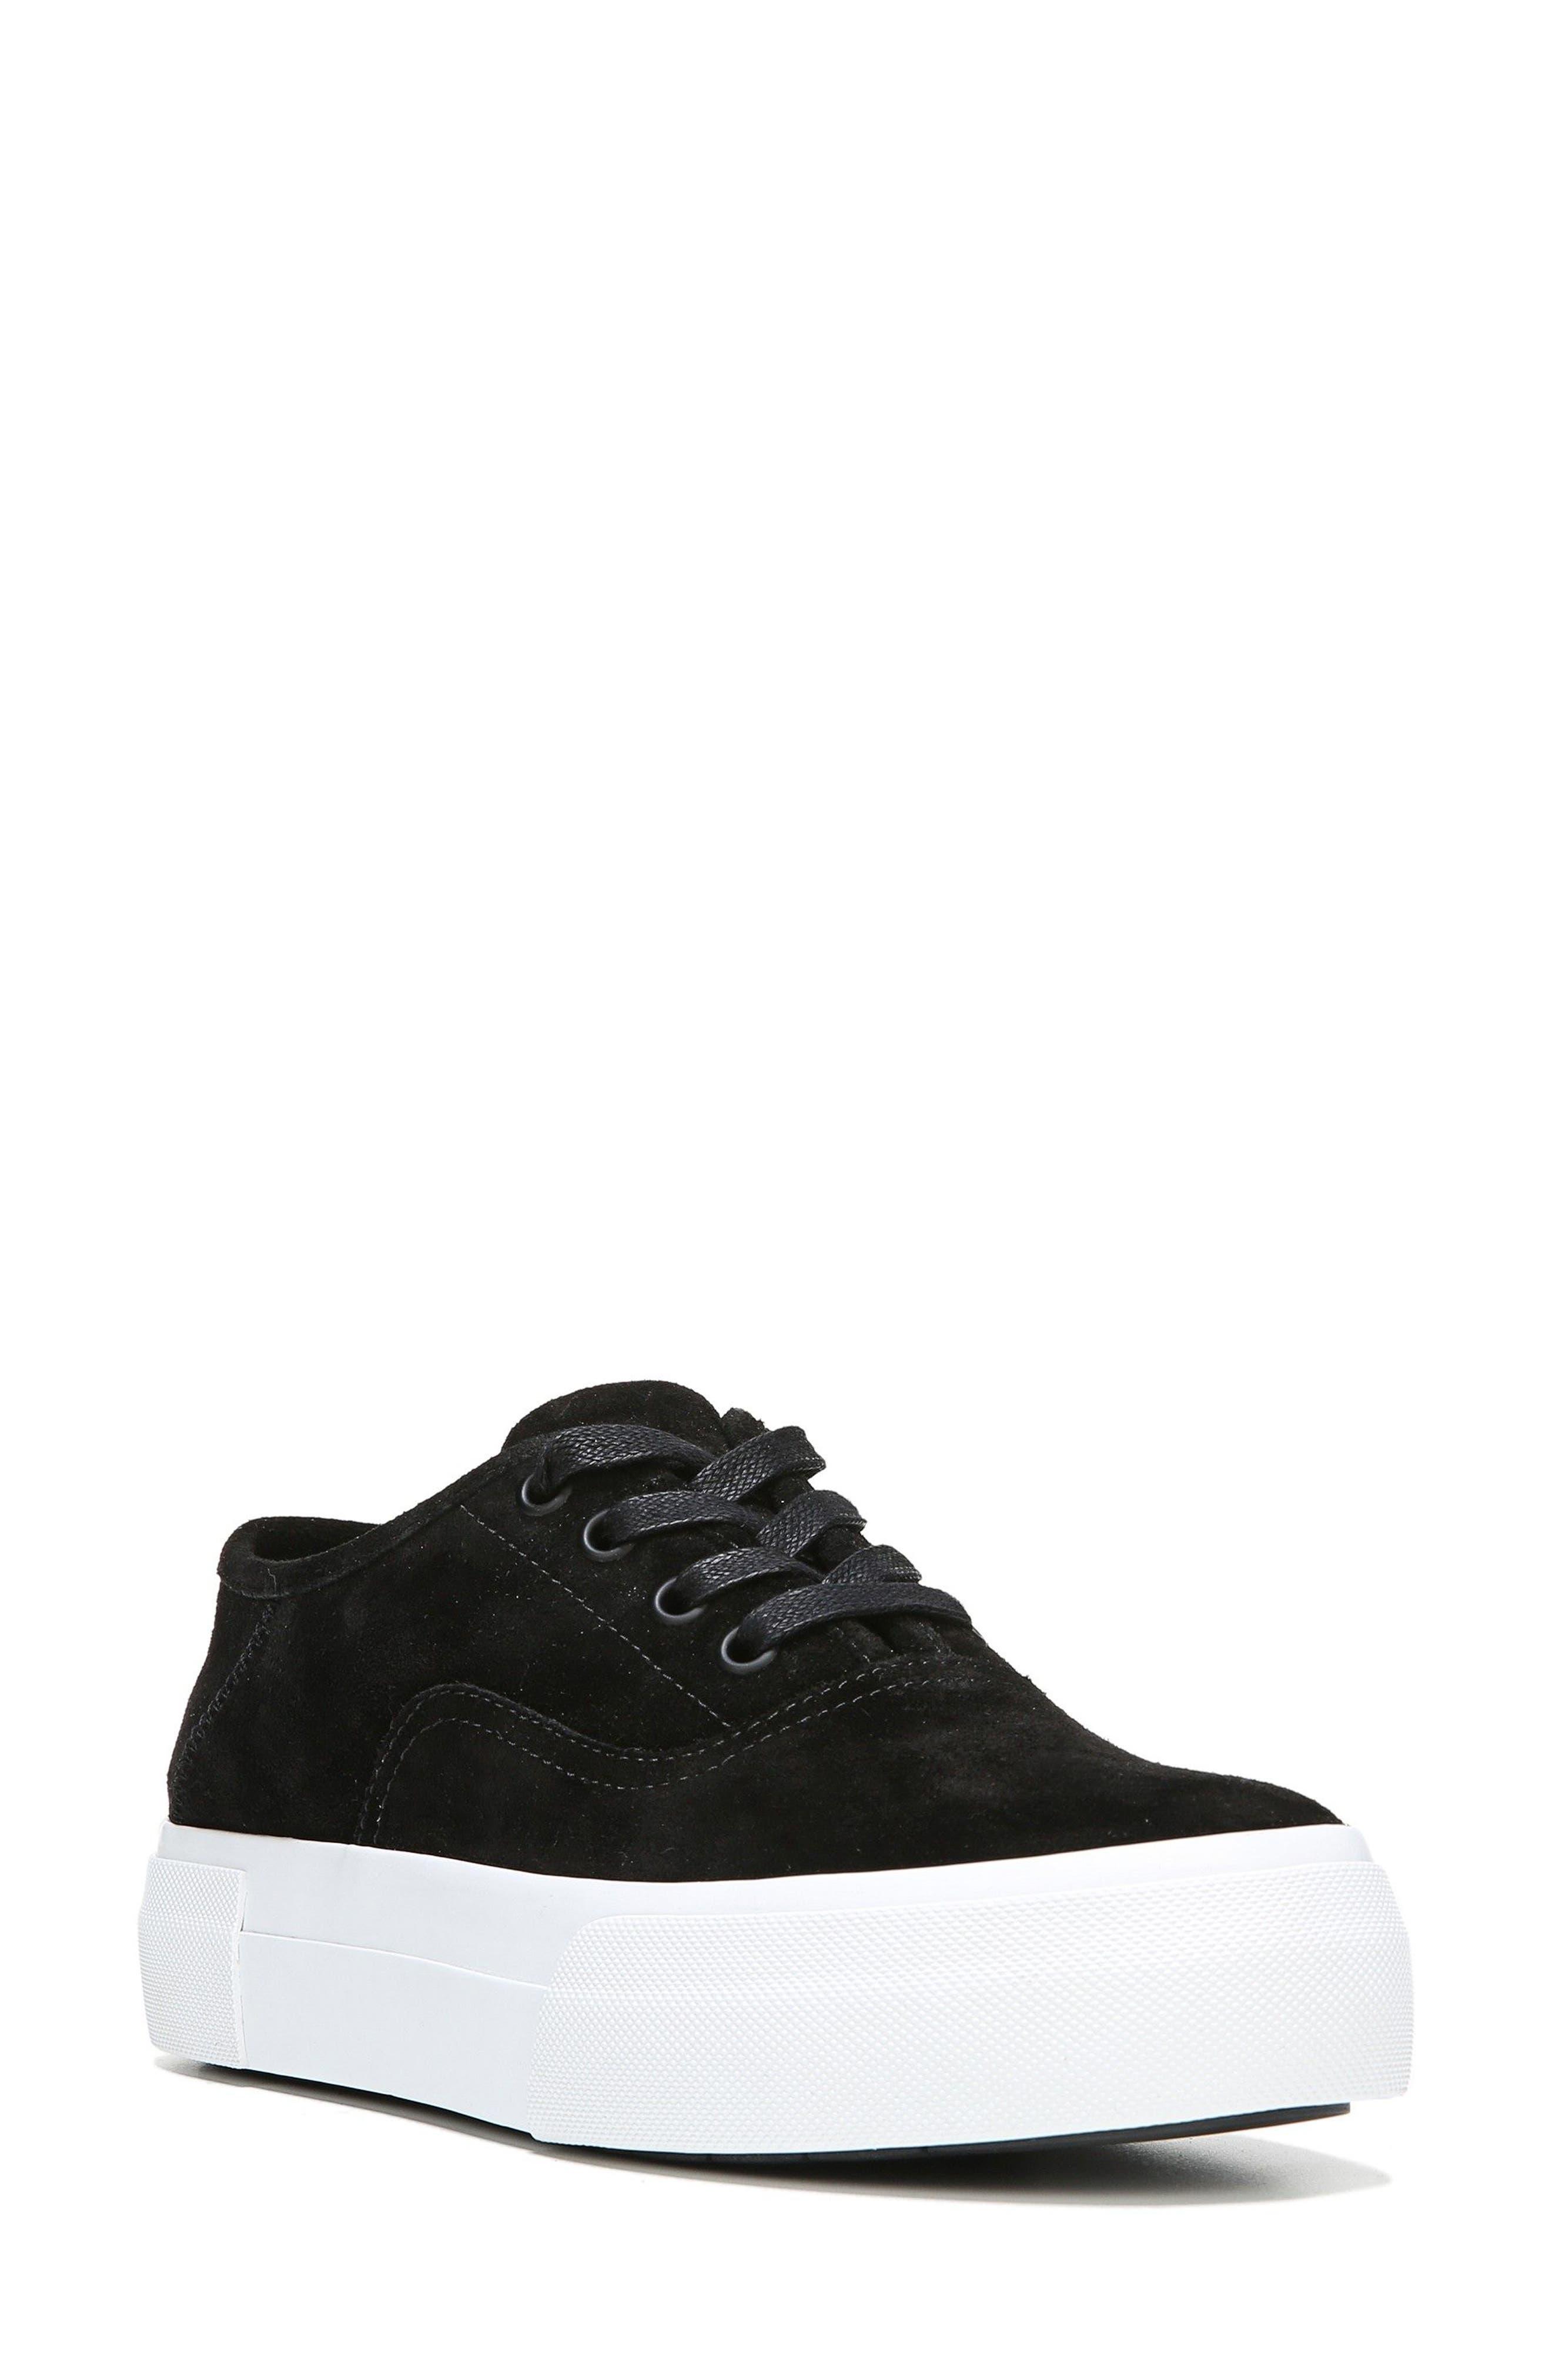 Copley Platform Sneaker,                             Main thumbnail 1, color,                             001